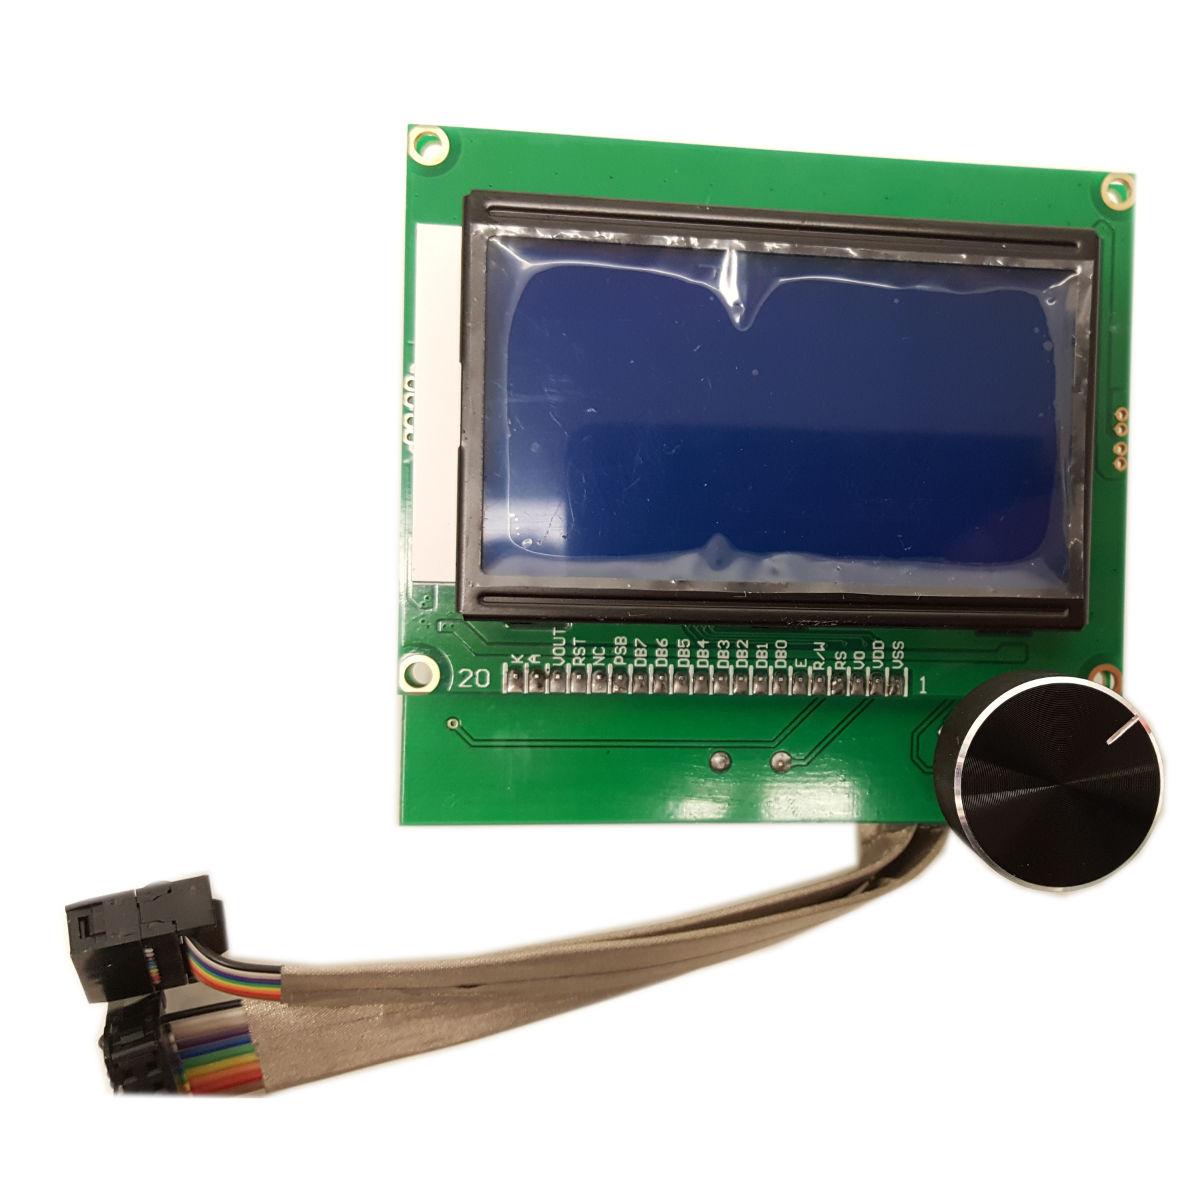 Creality CR-10S LCD - 3D Printer Canada